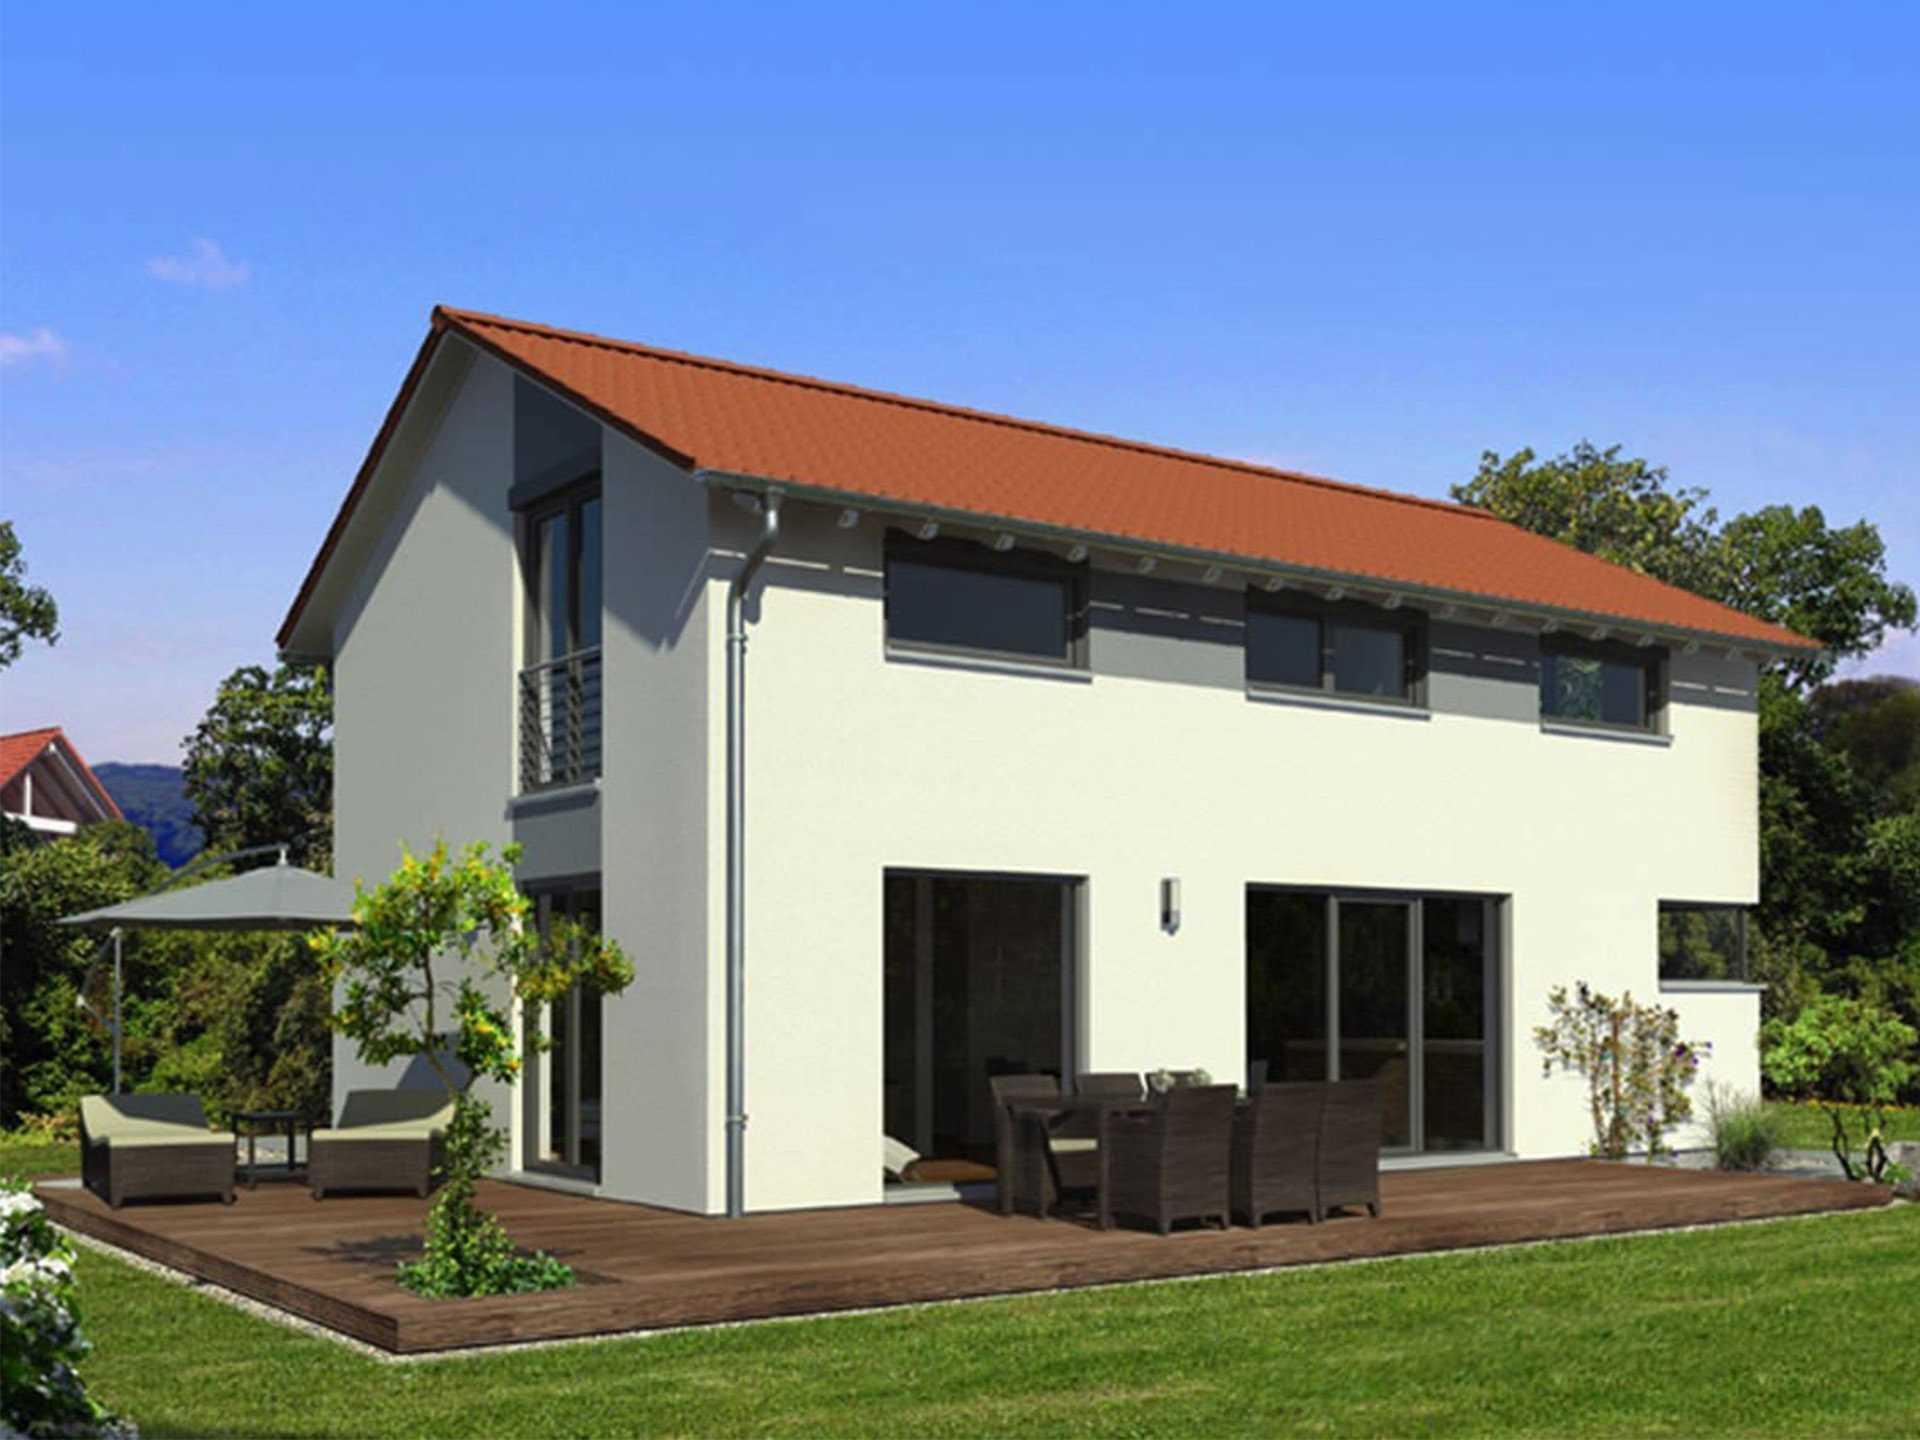 kitzlinger haus kompakt kitzlingerhaus. Black Bedroom Furniture Sets. Home Design Ideas